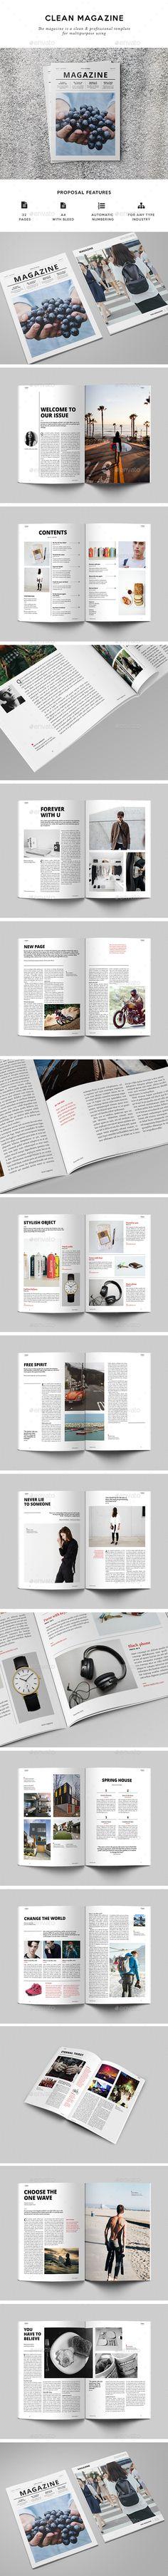 Multipurpose Magazine Template InDesign INDD. Download here: http://graphicriver.net/item/multipurpose-magazine/15682138?ref=ksioks